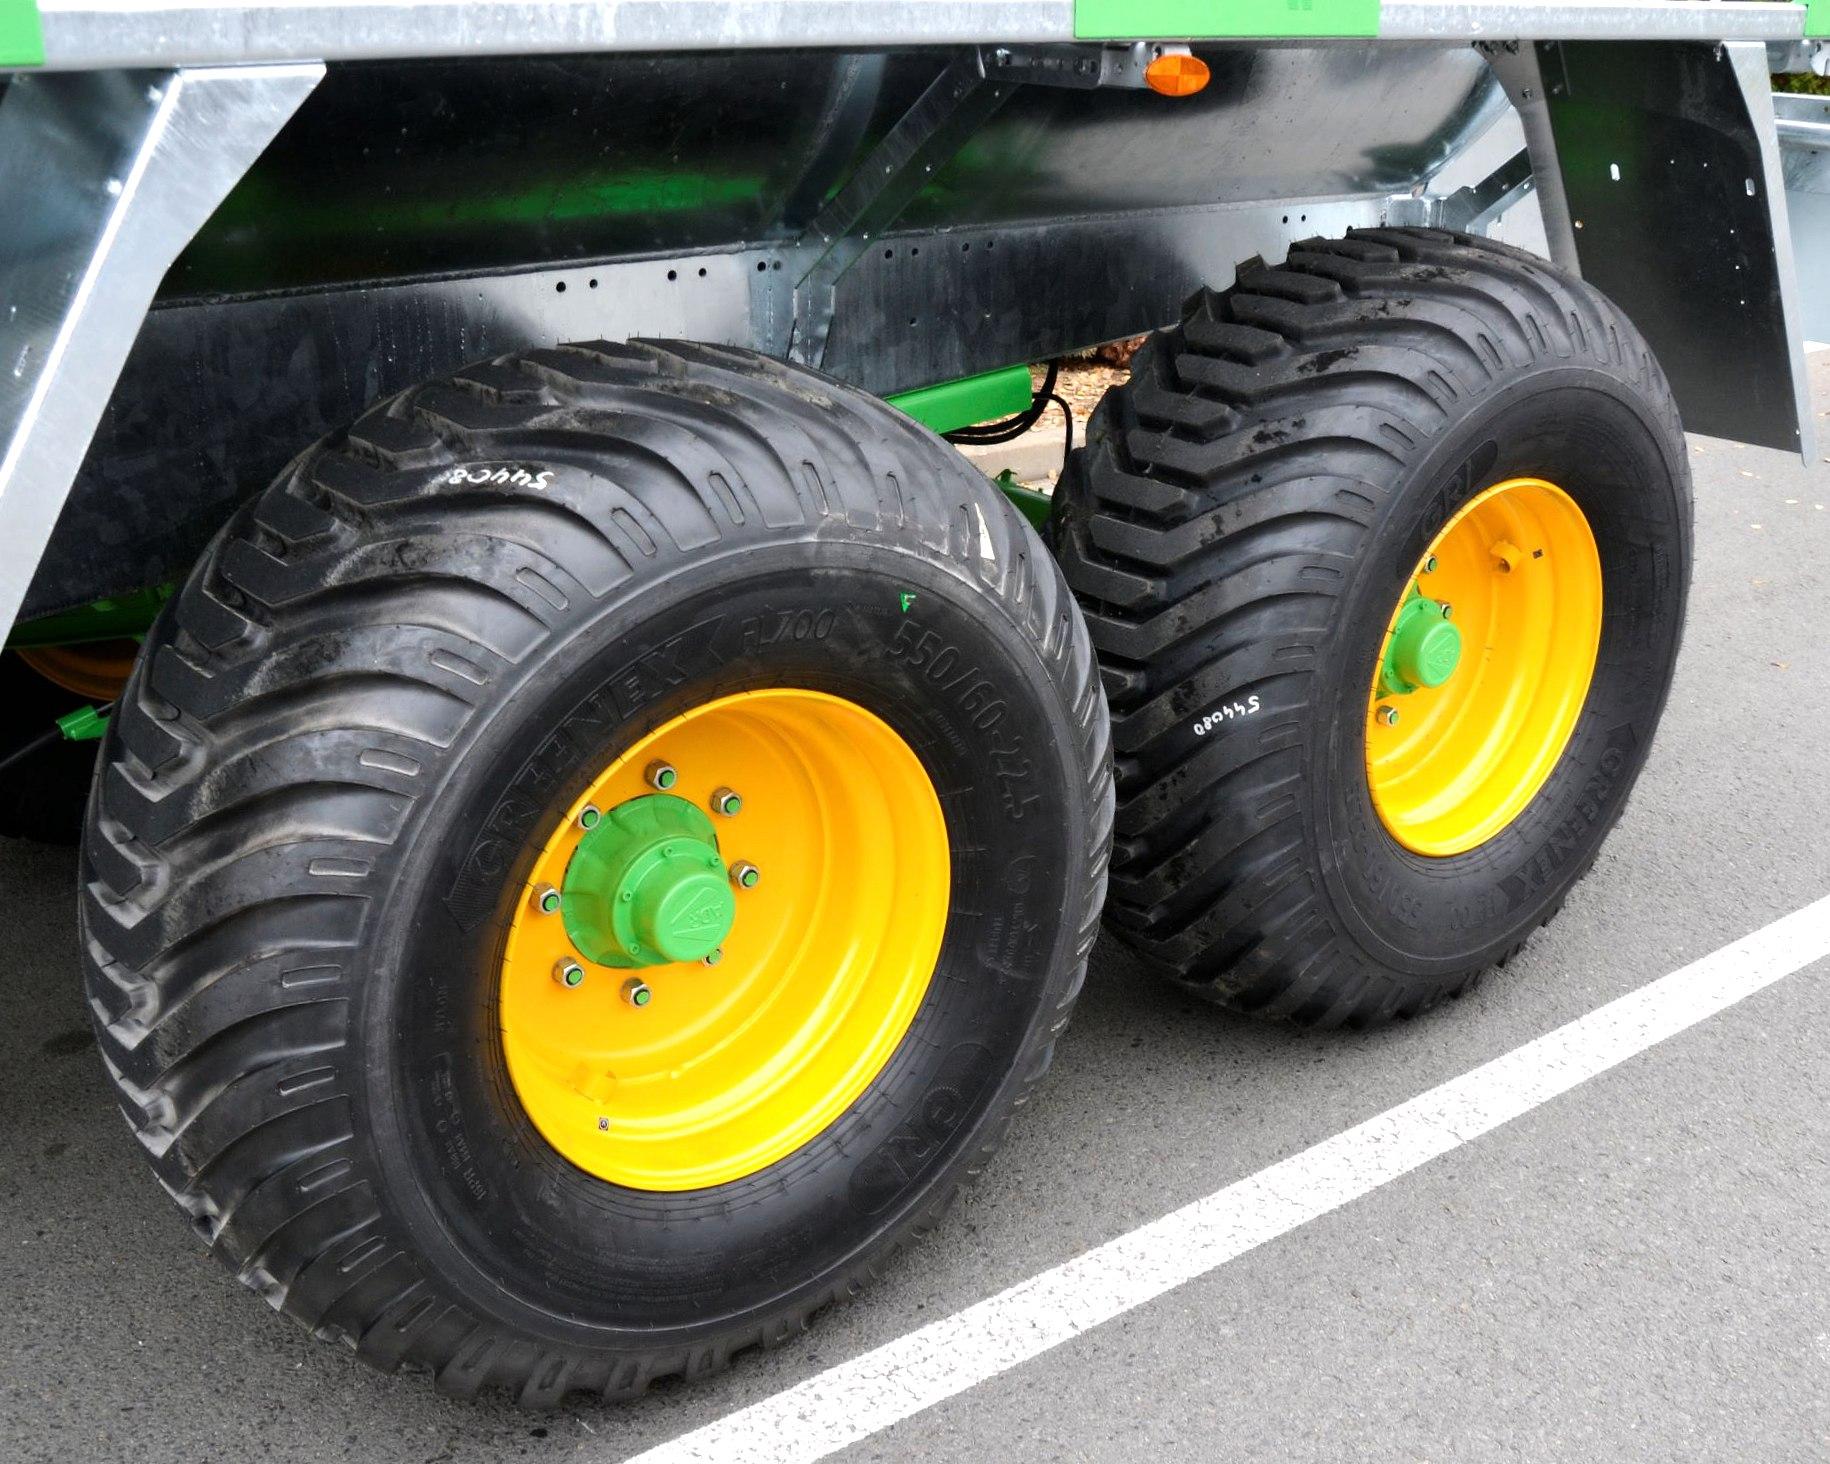 GRI supplying trailer manufacturer Joskin